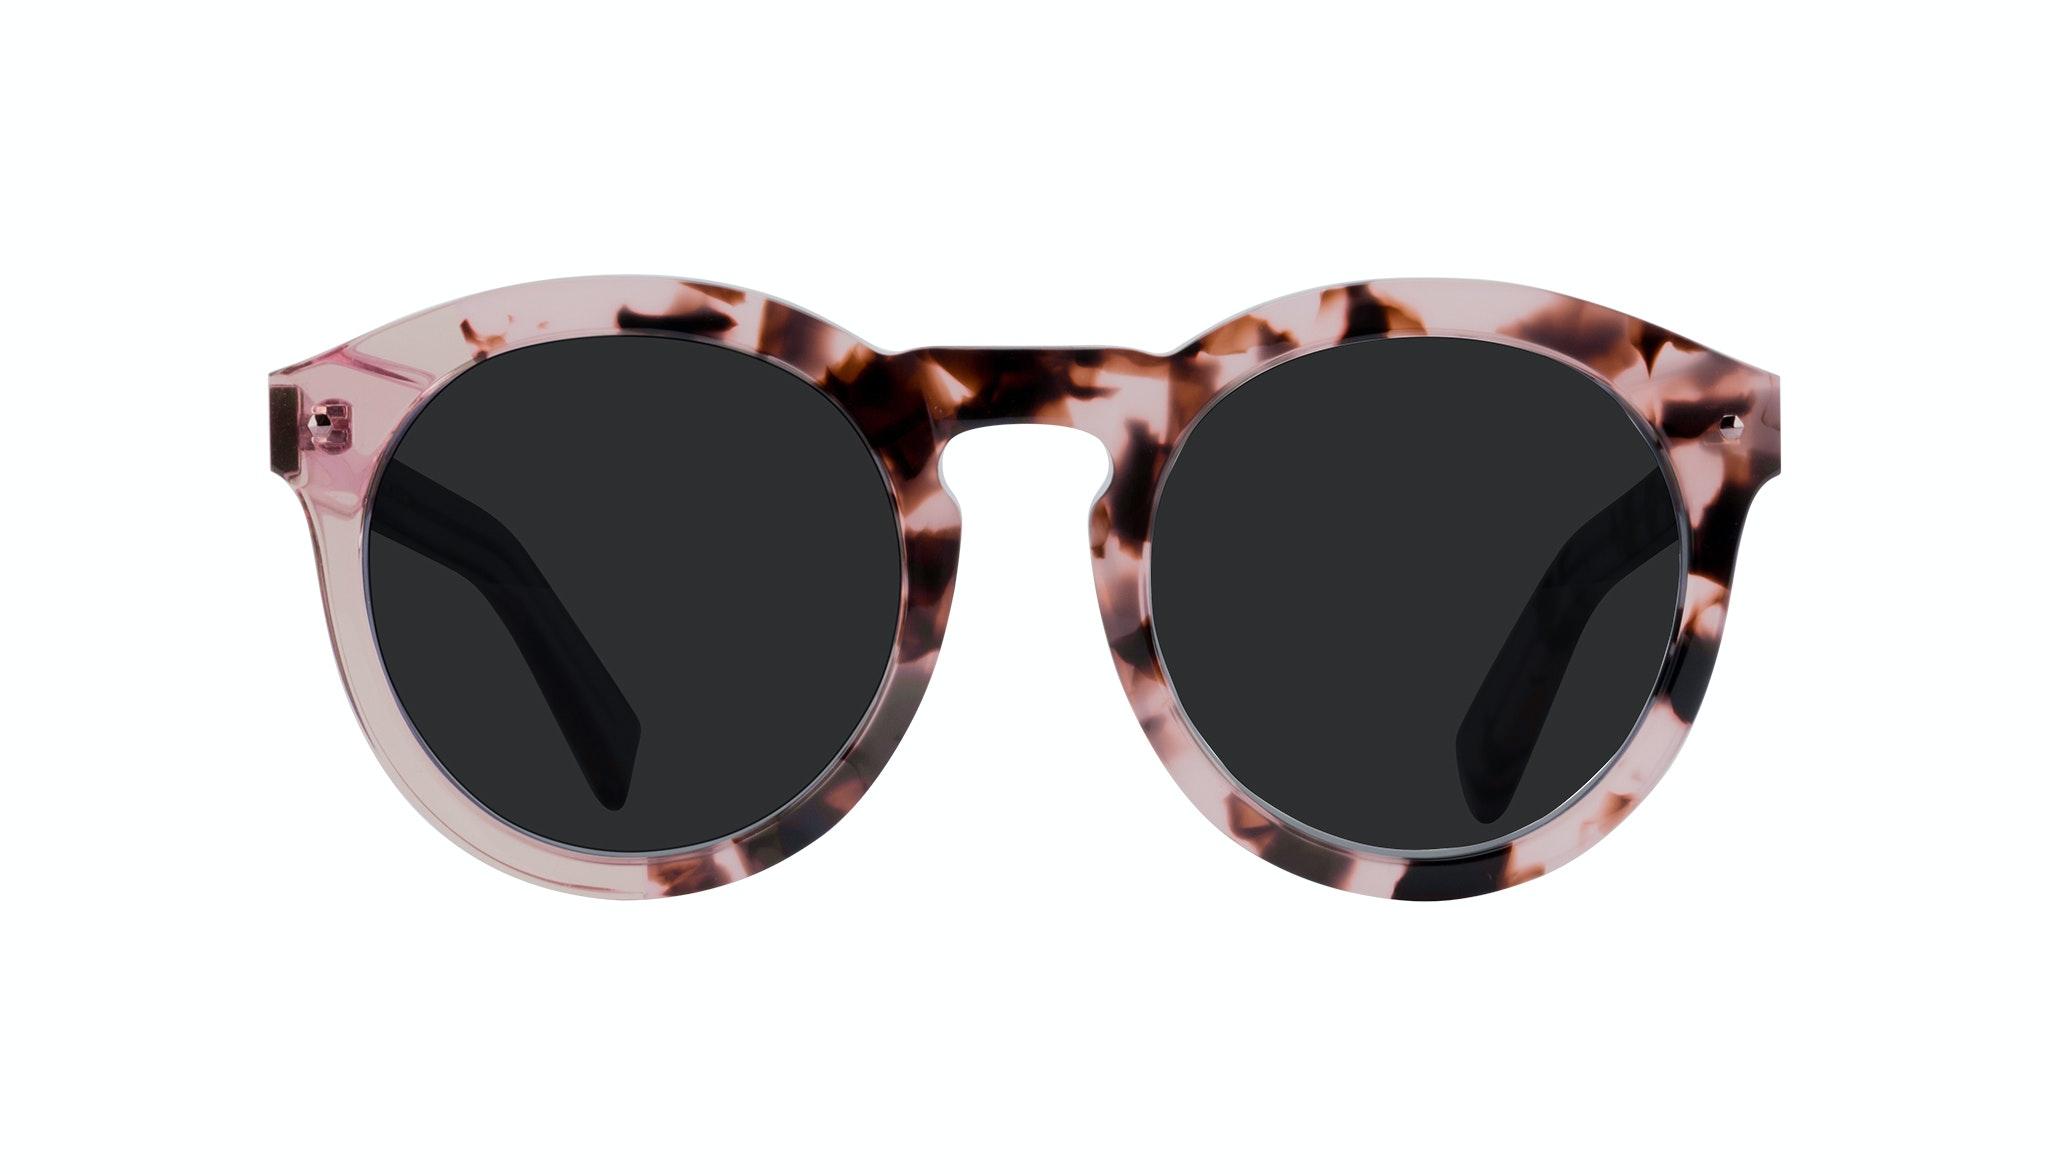 Affordable Fashion Glasses Round Sunglasses Women Mood Blush Tortoise Front